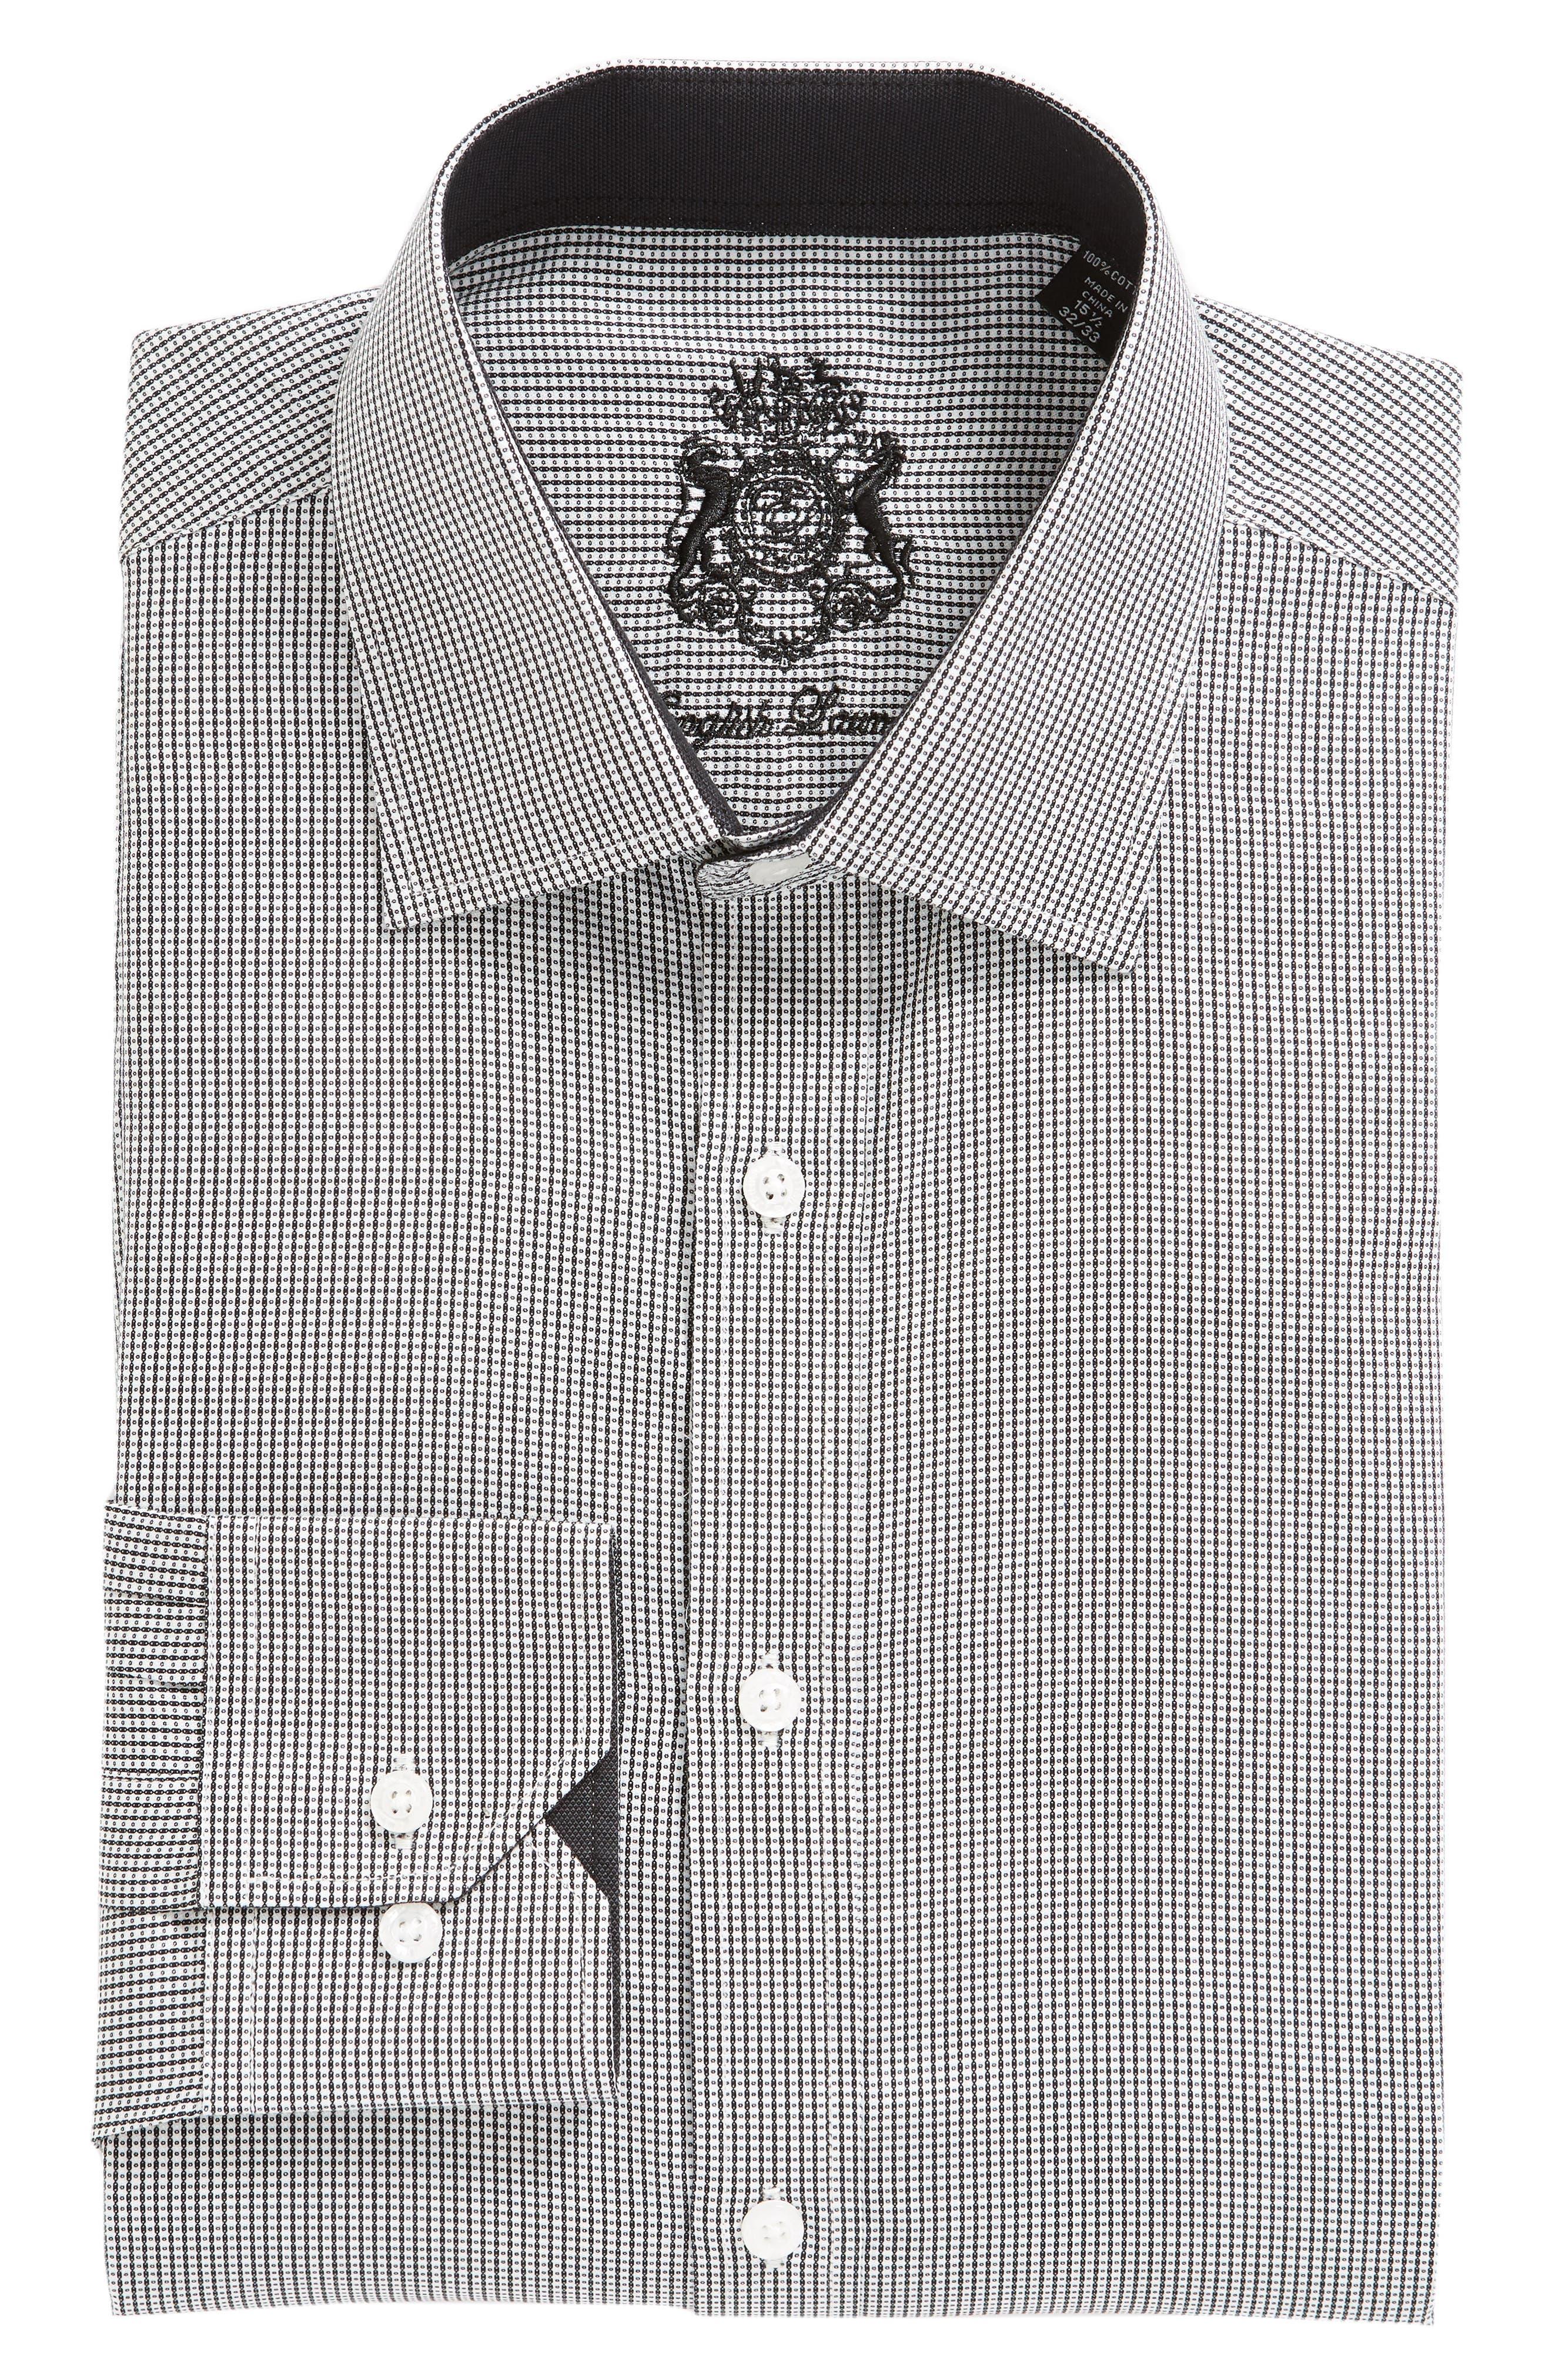 ENGLISH LAUNDRY,                             Regular Fit Check Dress Shirt,                             Alternate thumbnail 5, color,                             001